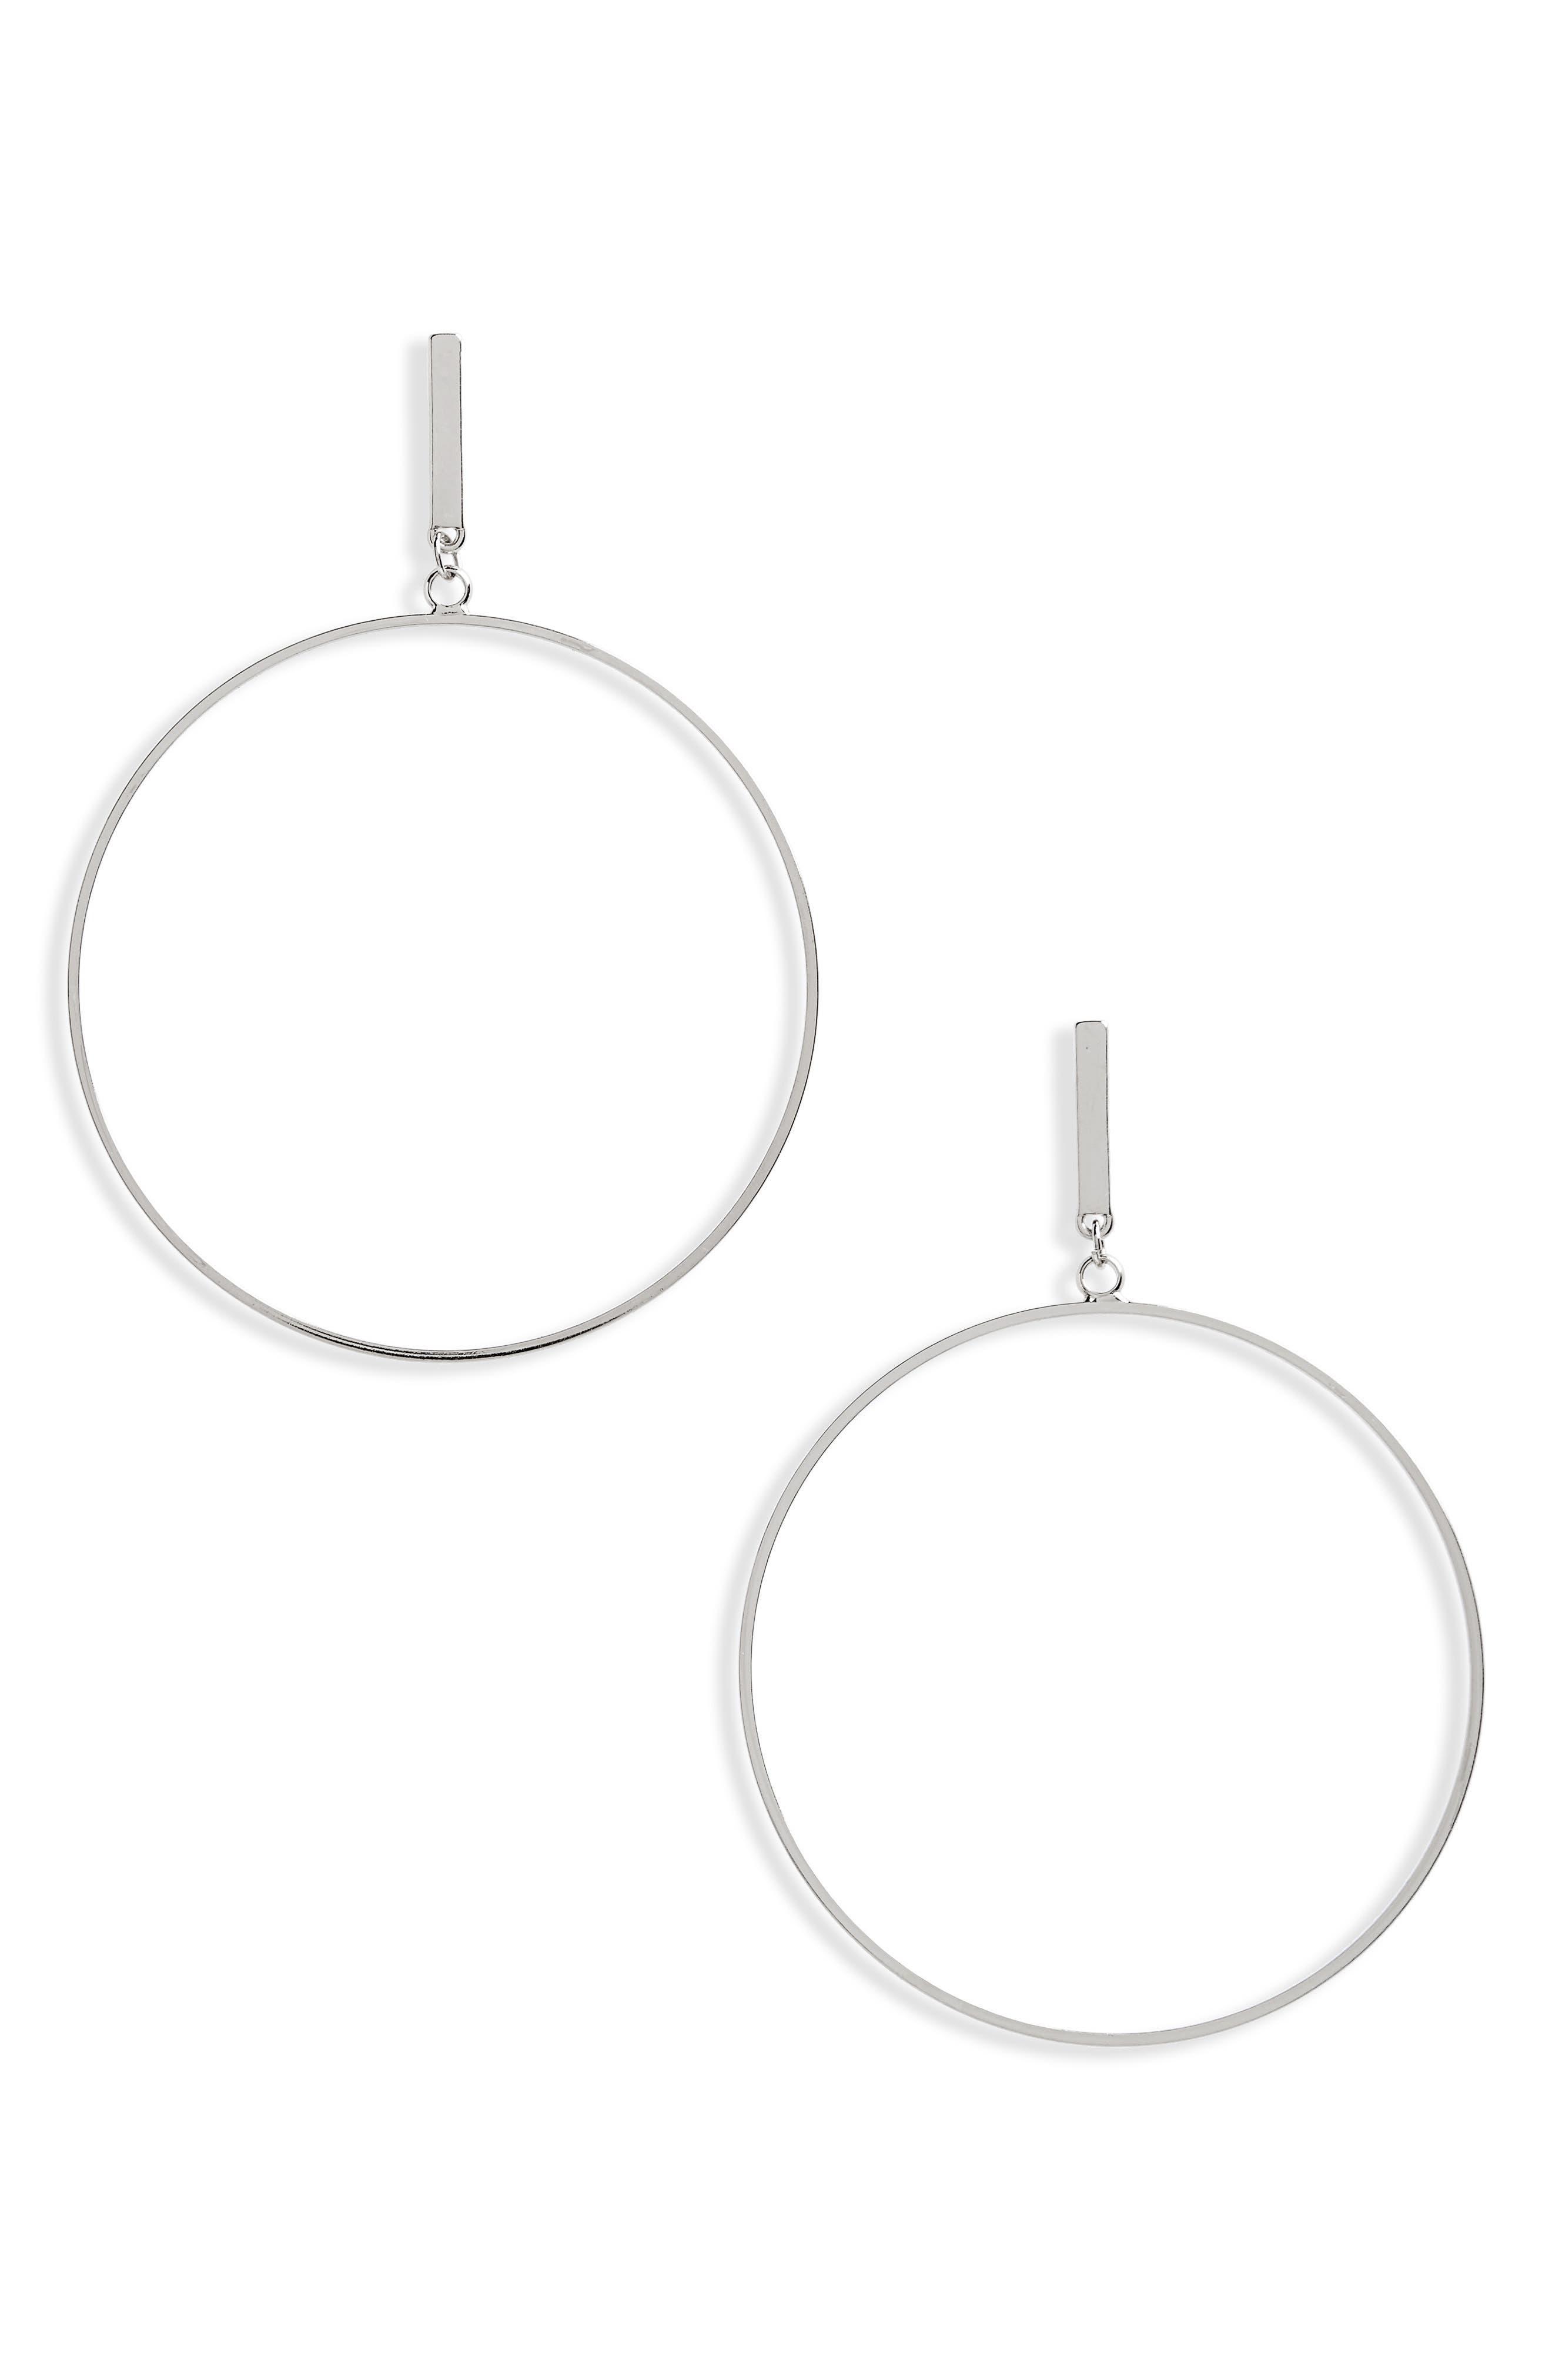 Large Post Hoop Earrings,                             Main thumbnail 1, color,